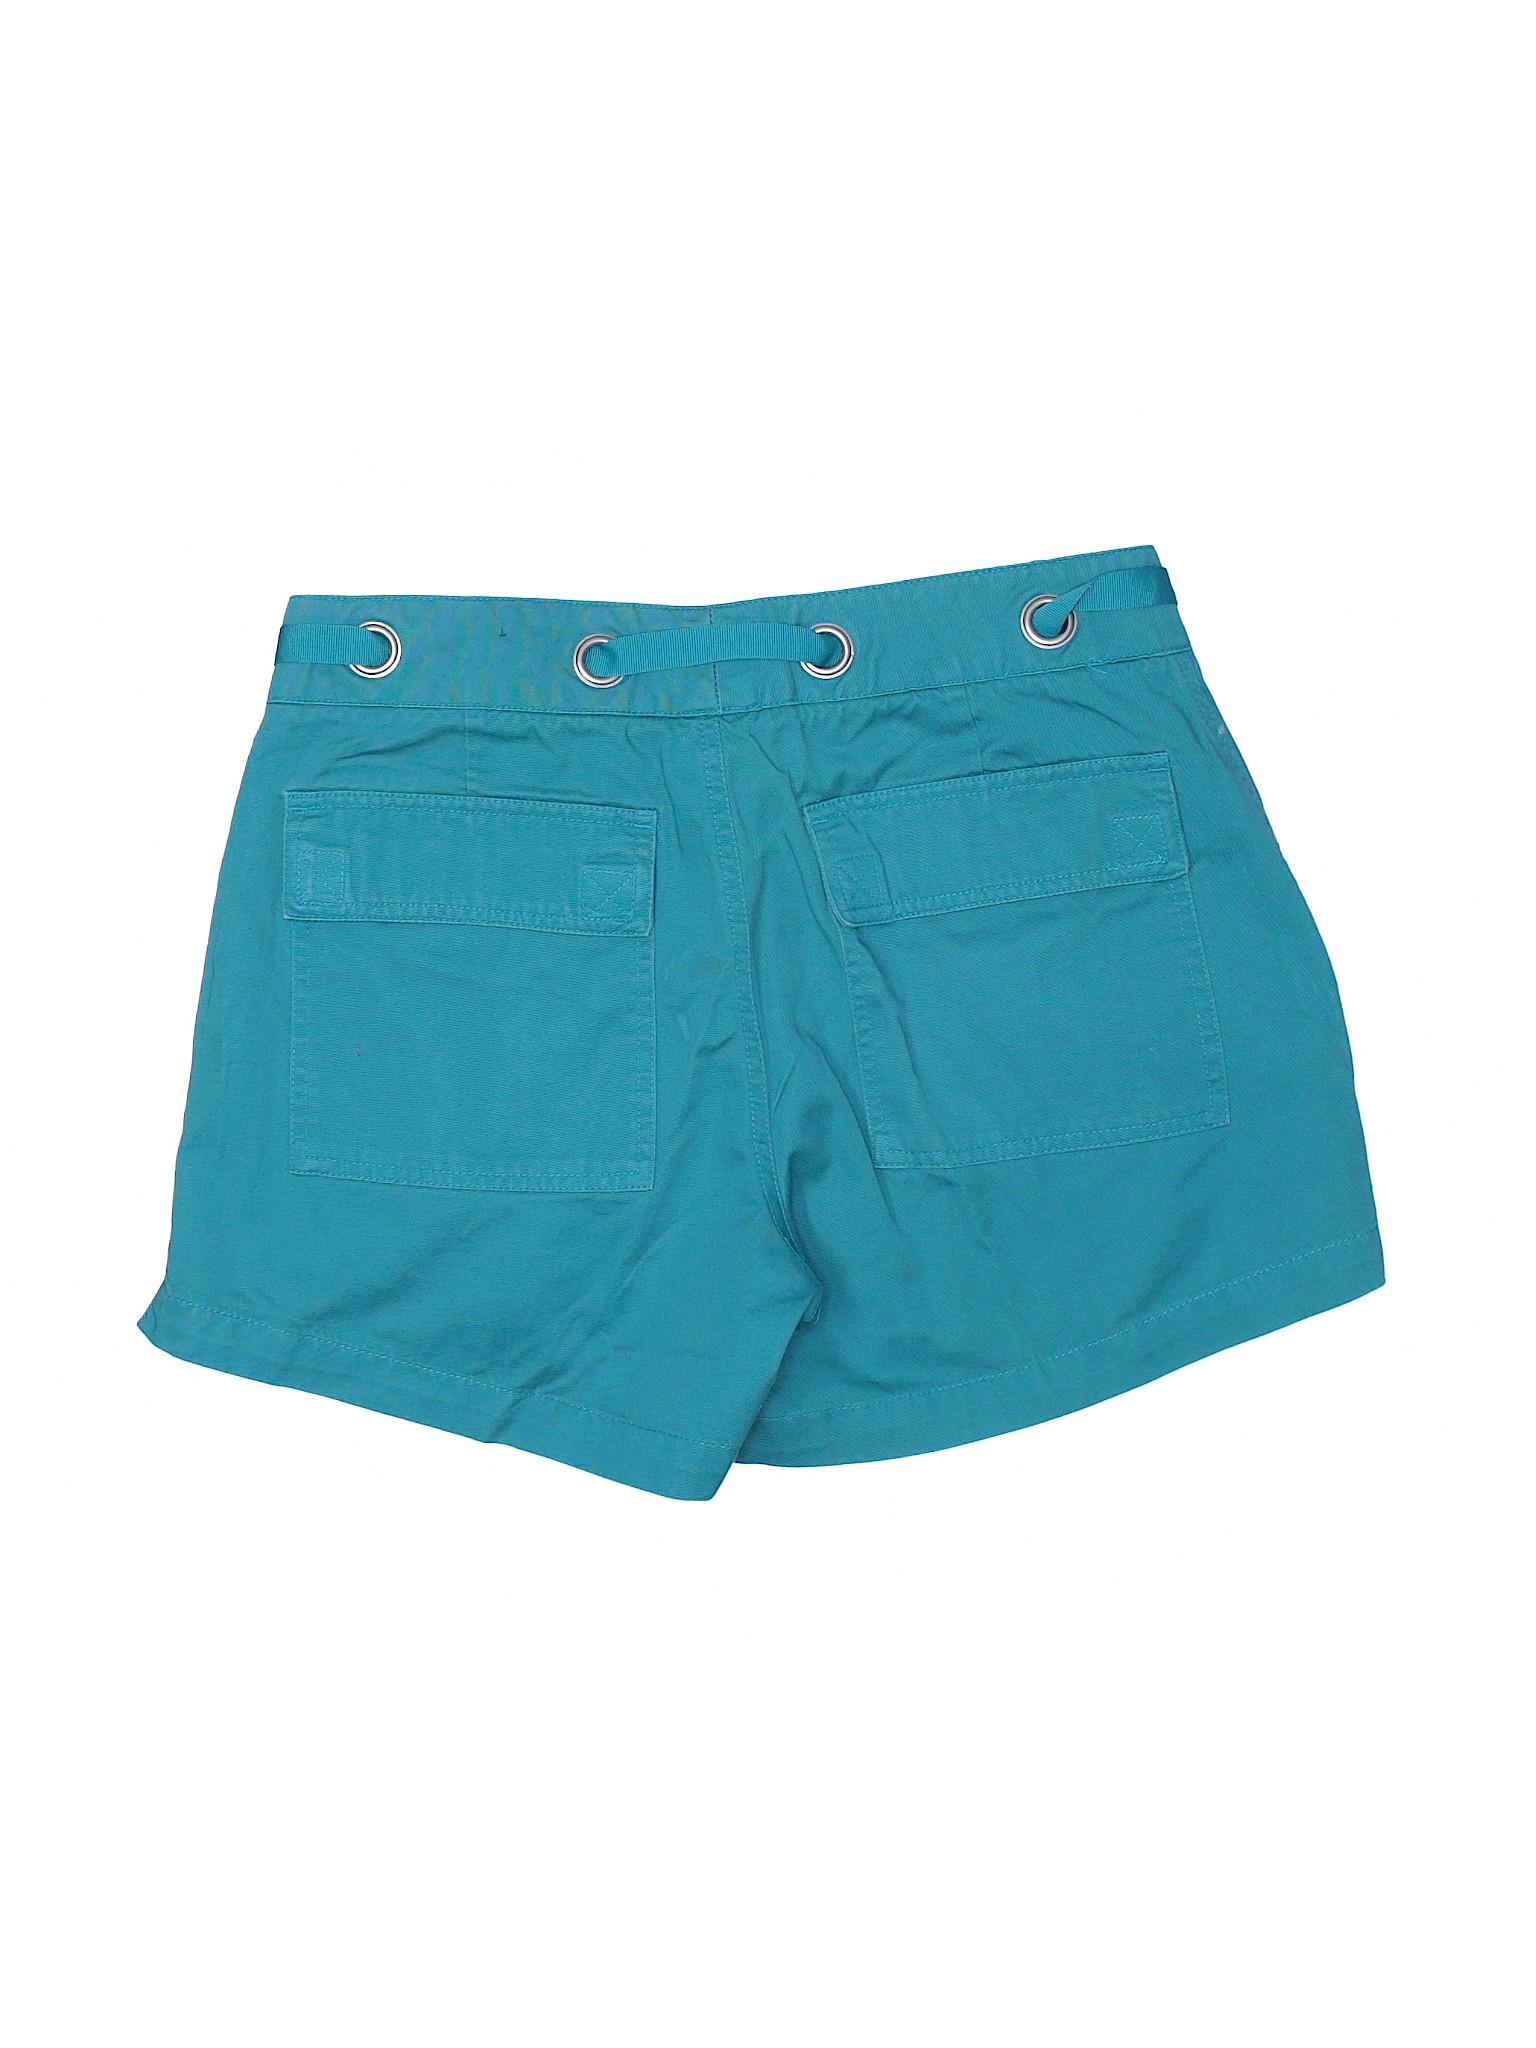 Austin Clothing Boutique Gal2P87ZOR Shorts Khaki ZHwdqdU